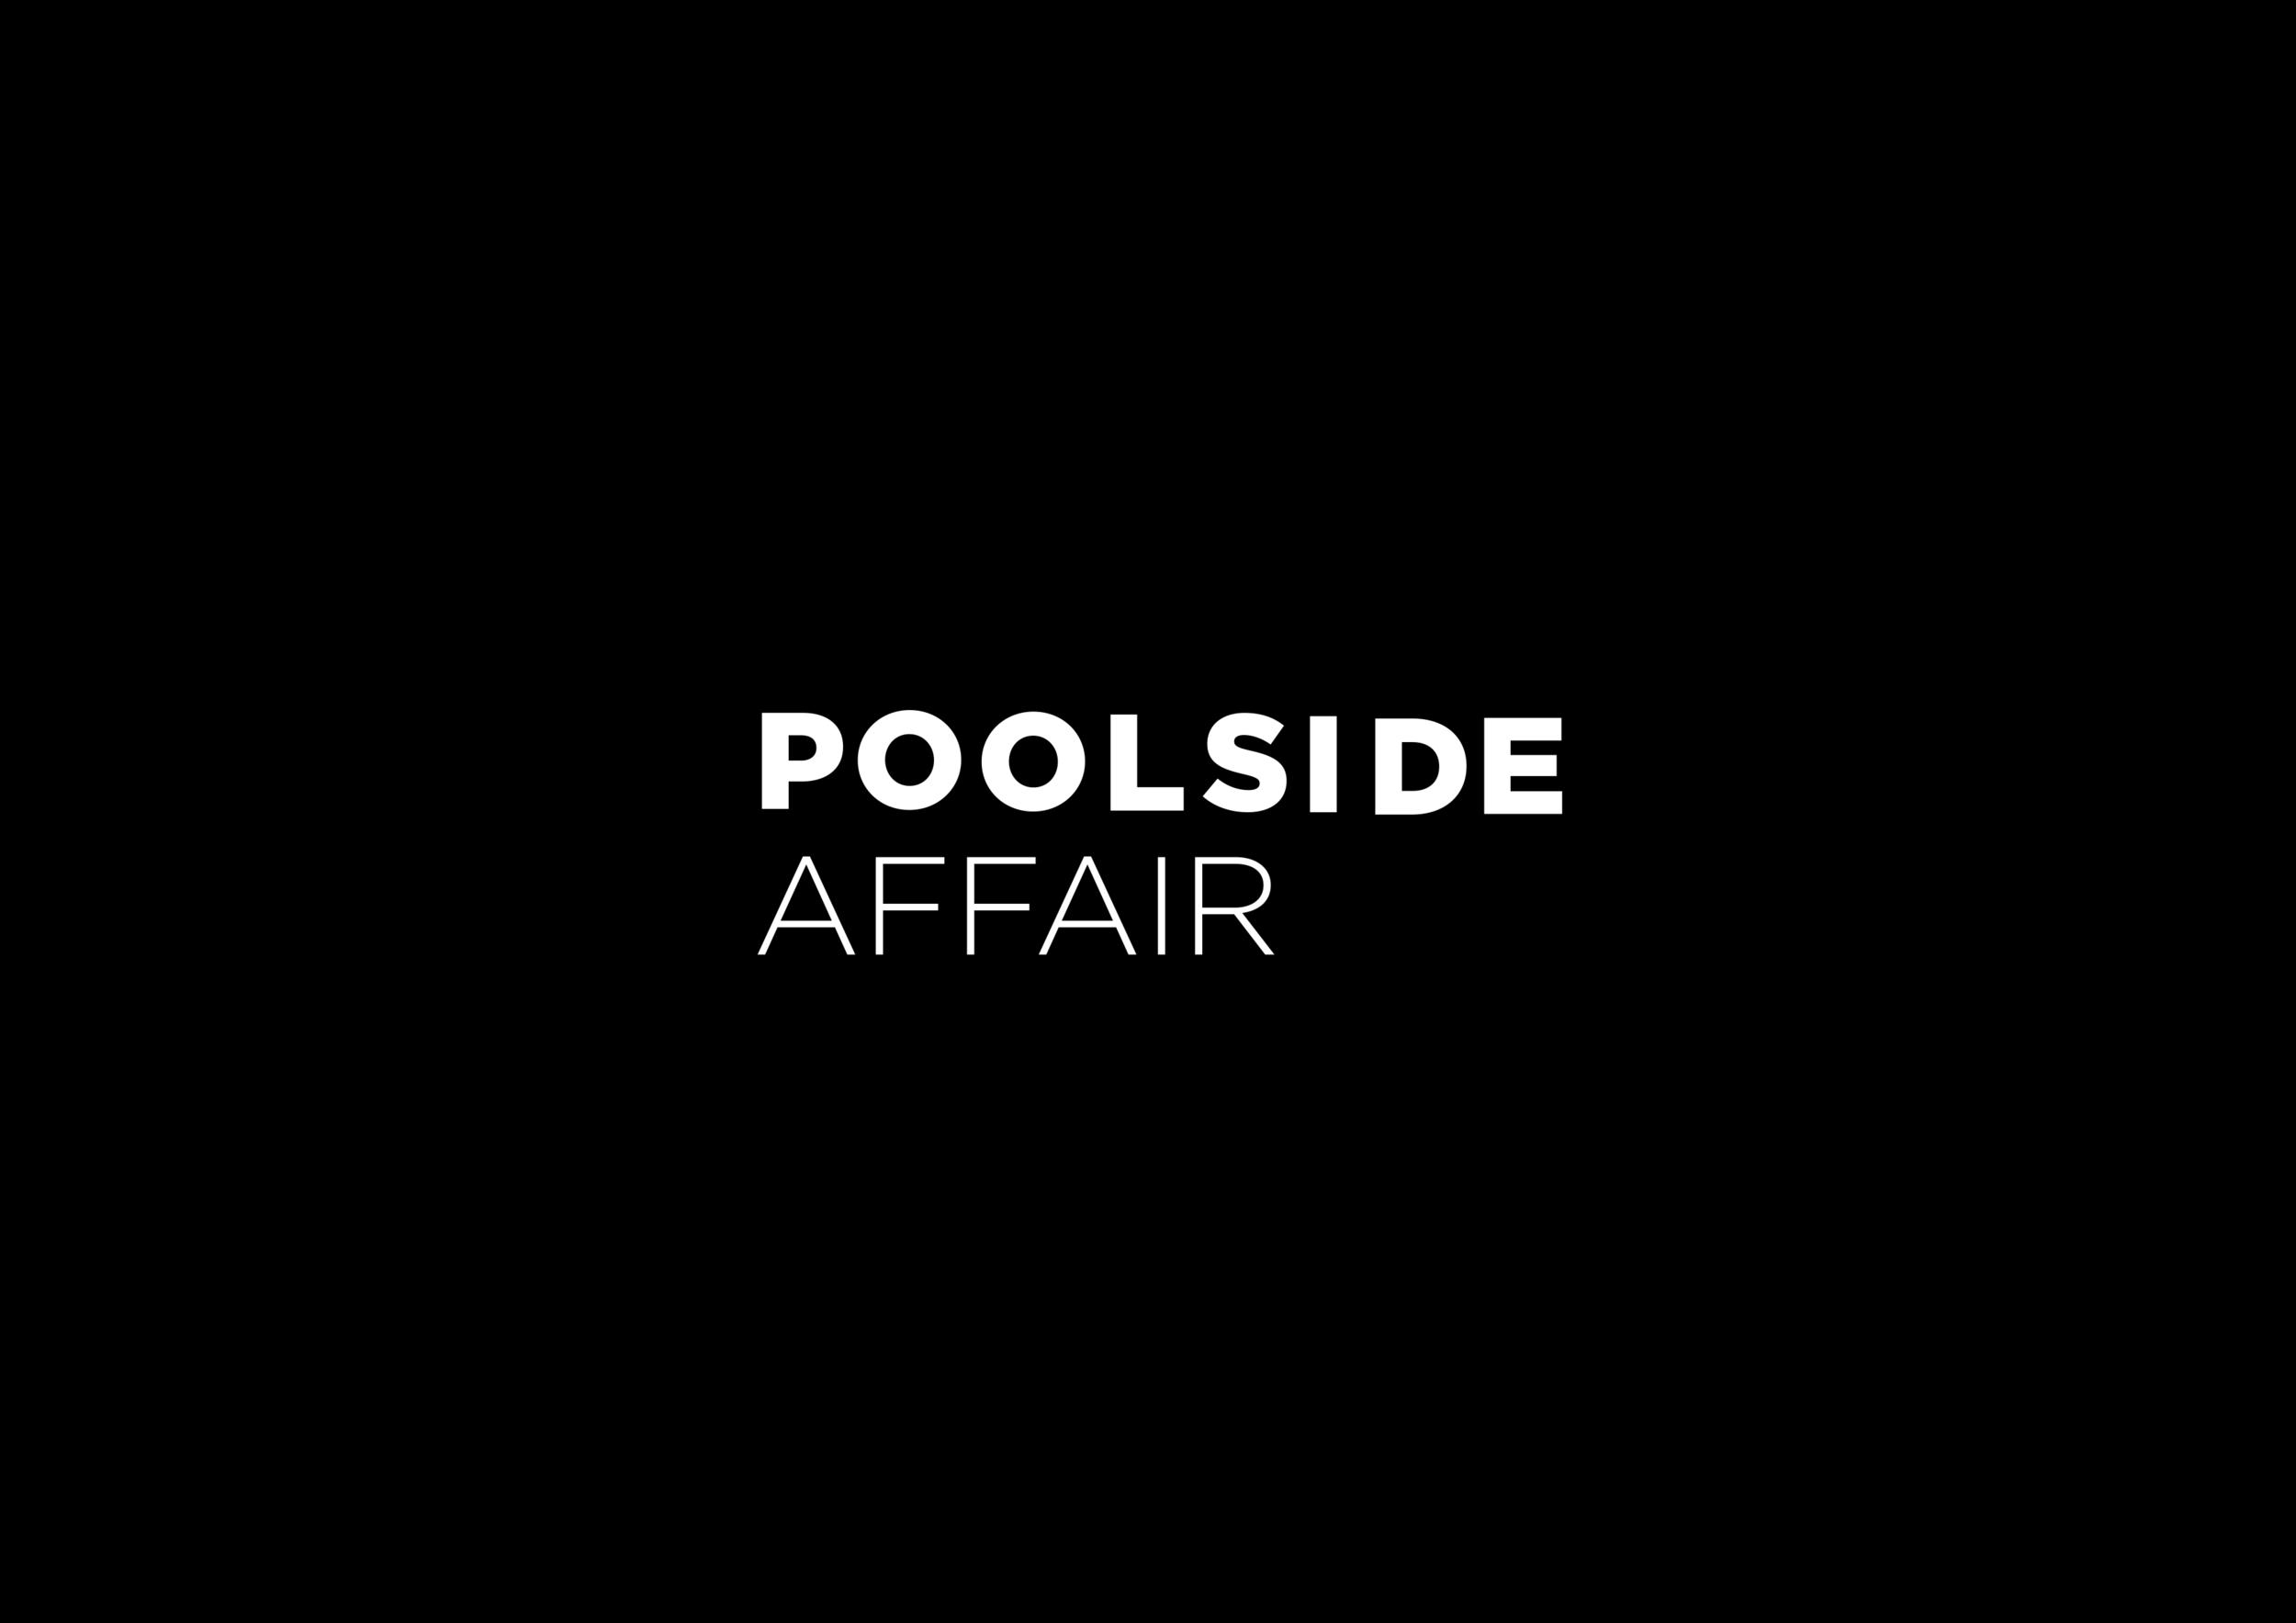 Poolside Affair logo.png